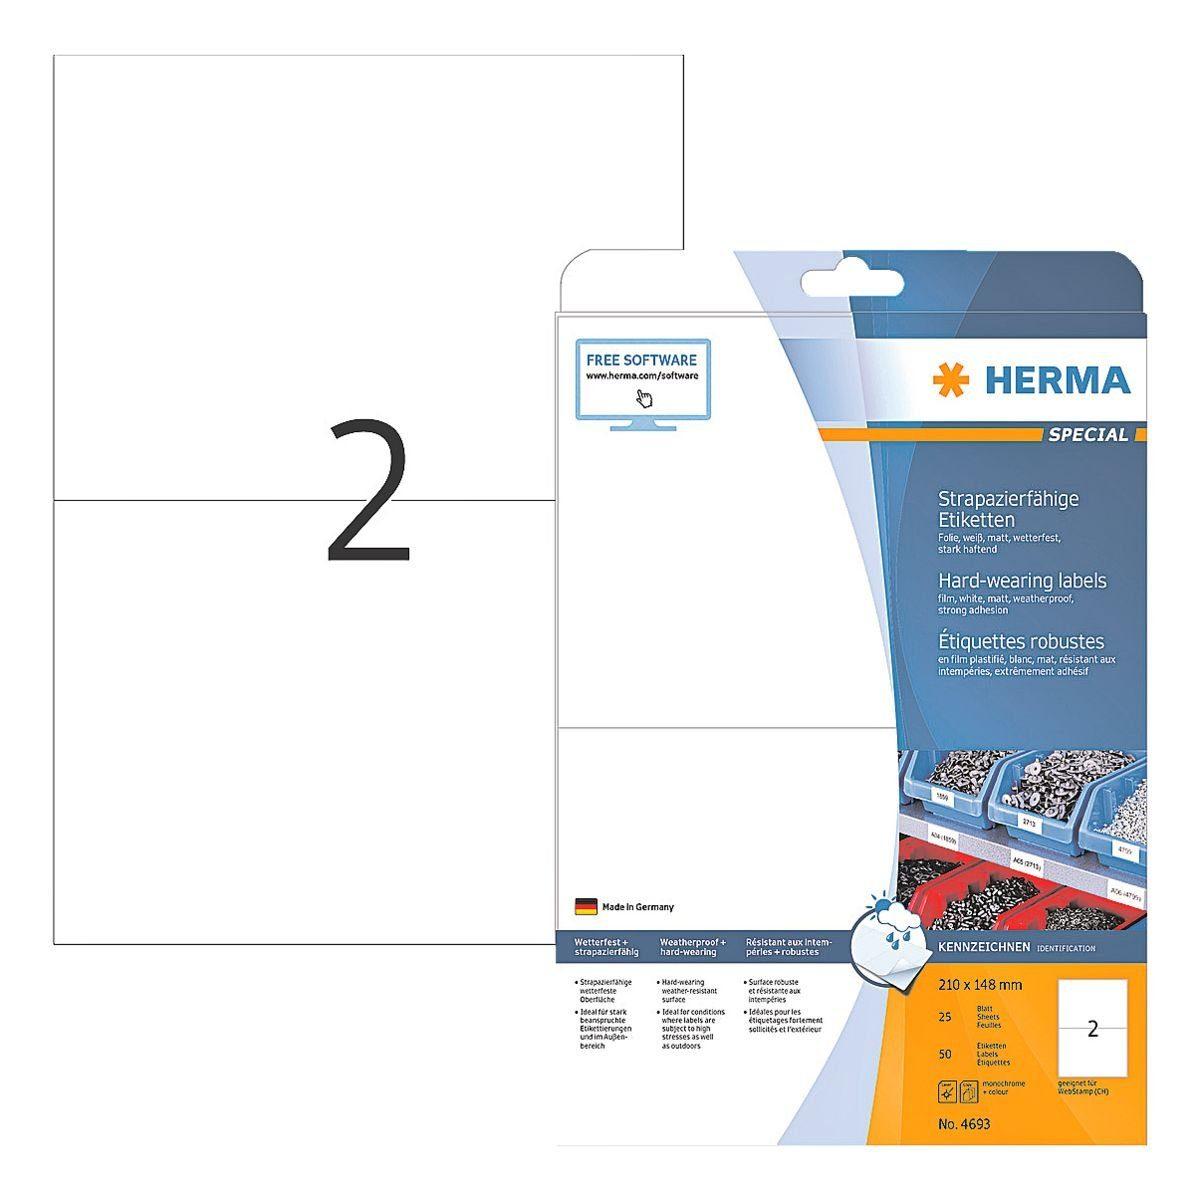 HERMA Outdoor Folien-Etiketten 50 Stück »Special«